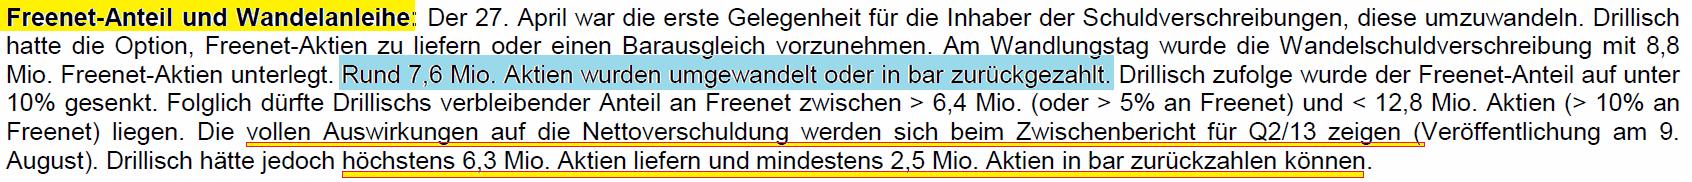 dri_wandel_warburg.png